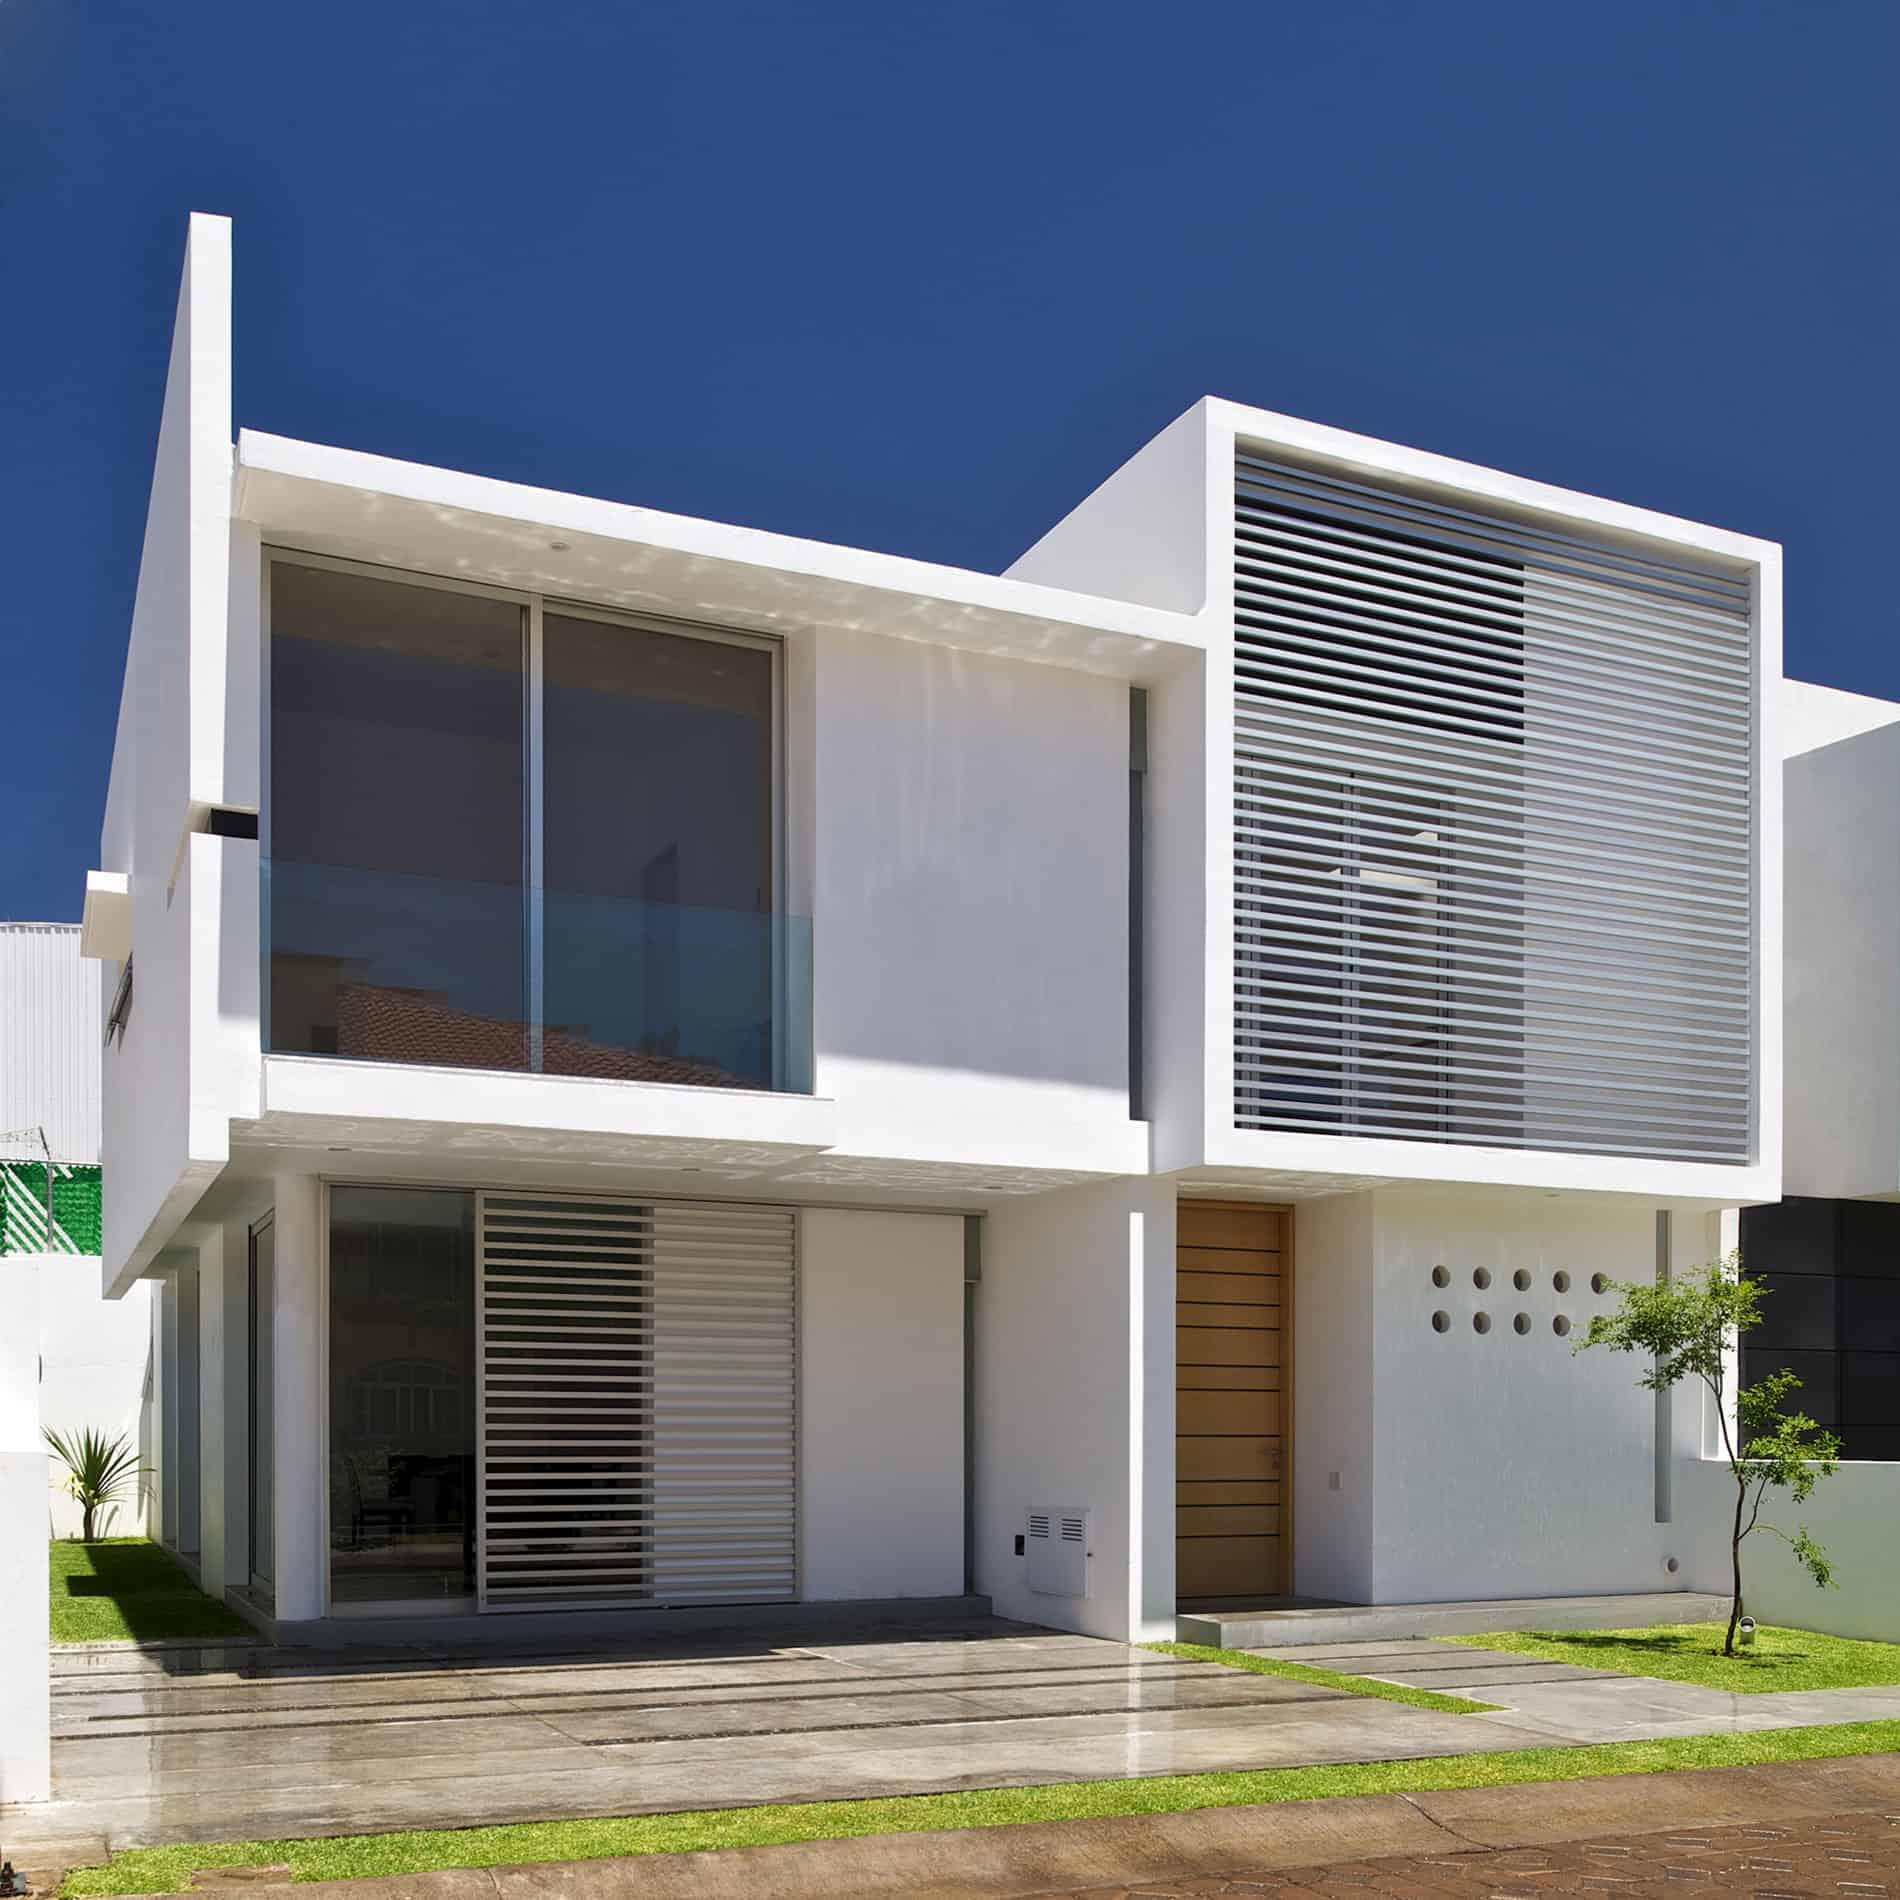 Seth Navarrete House by Agraz Arquitectos (3)